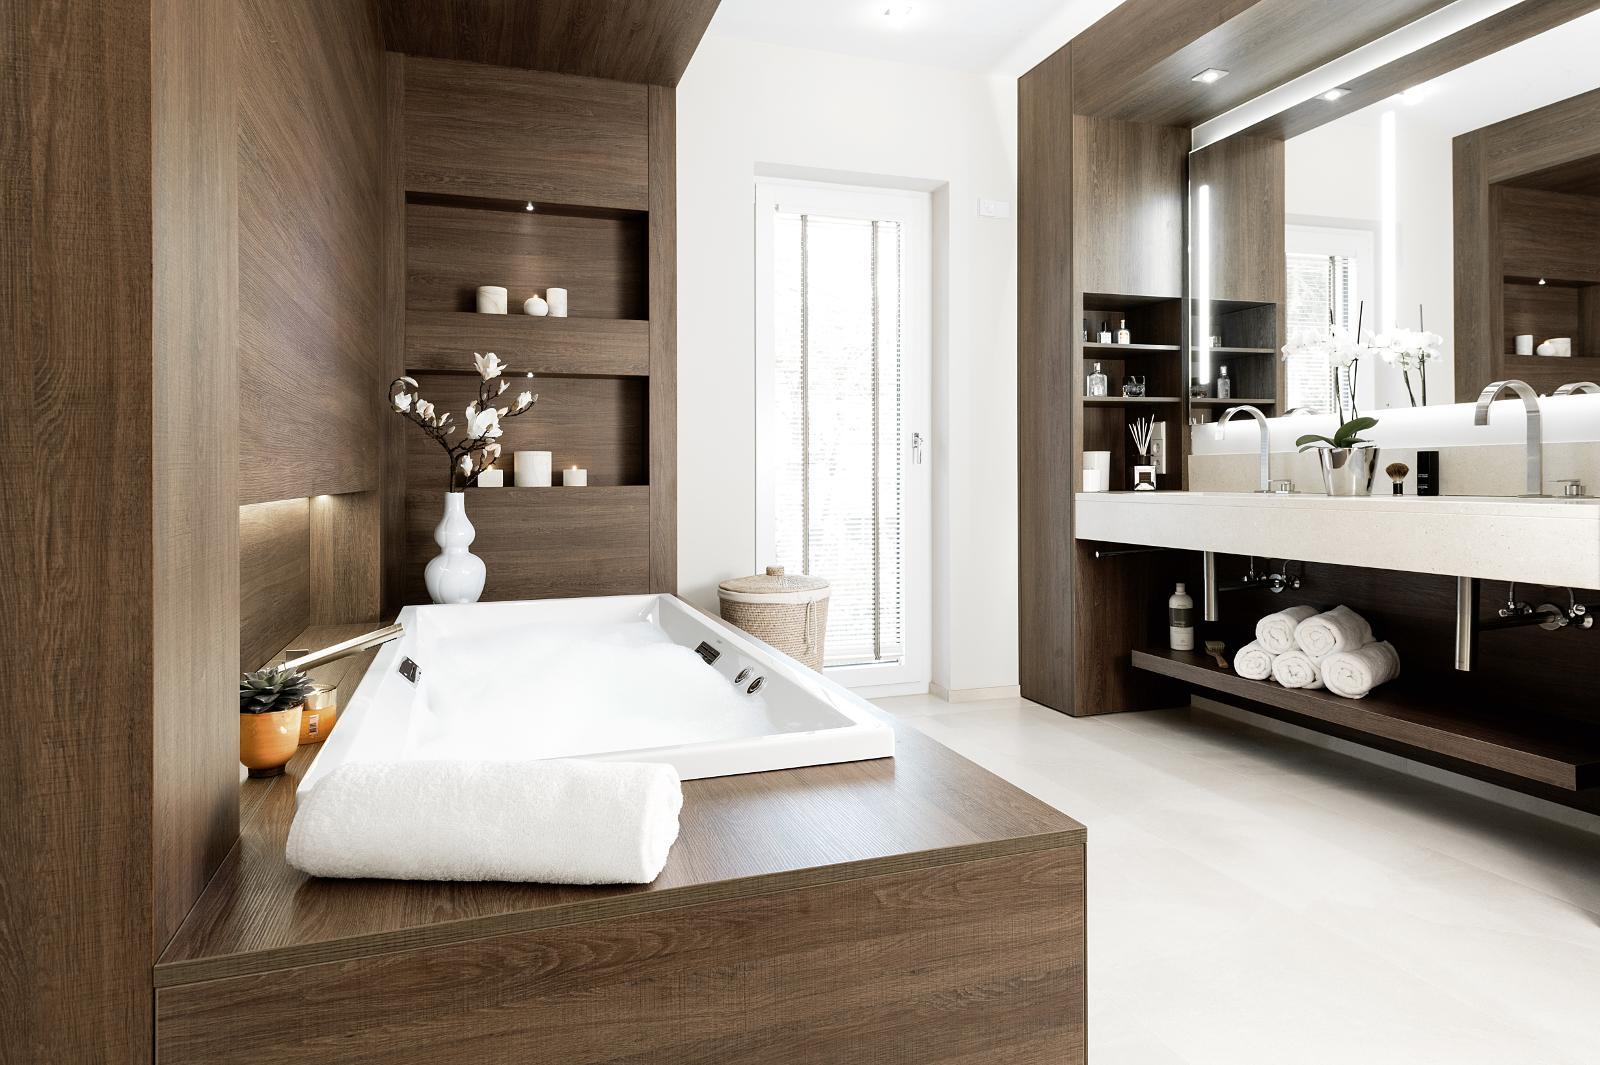 Holz im Badezimmer   bad & heizung